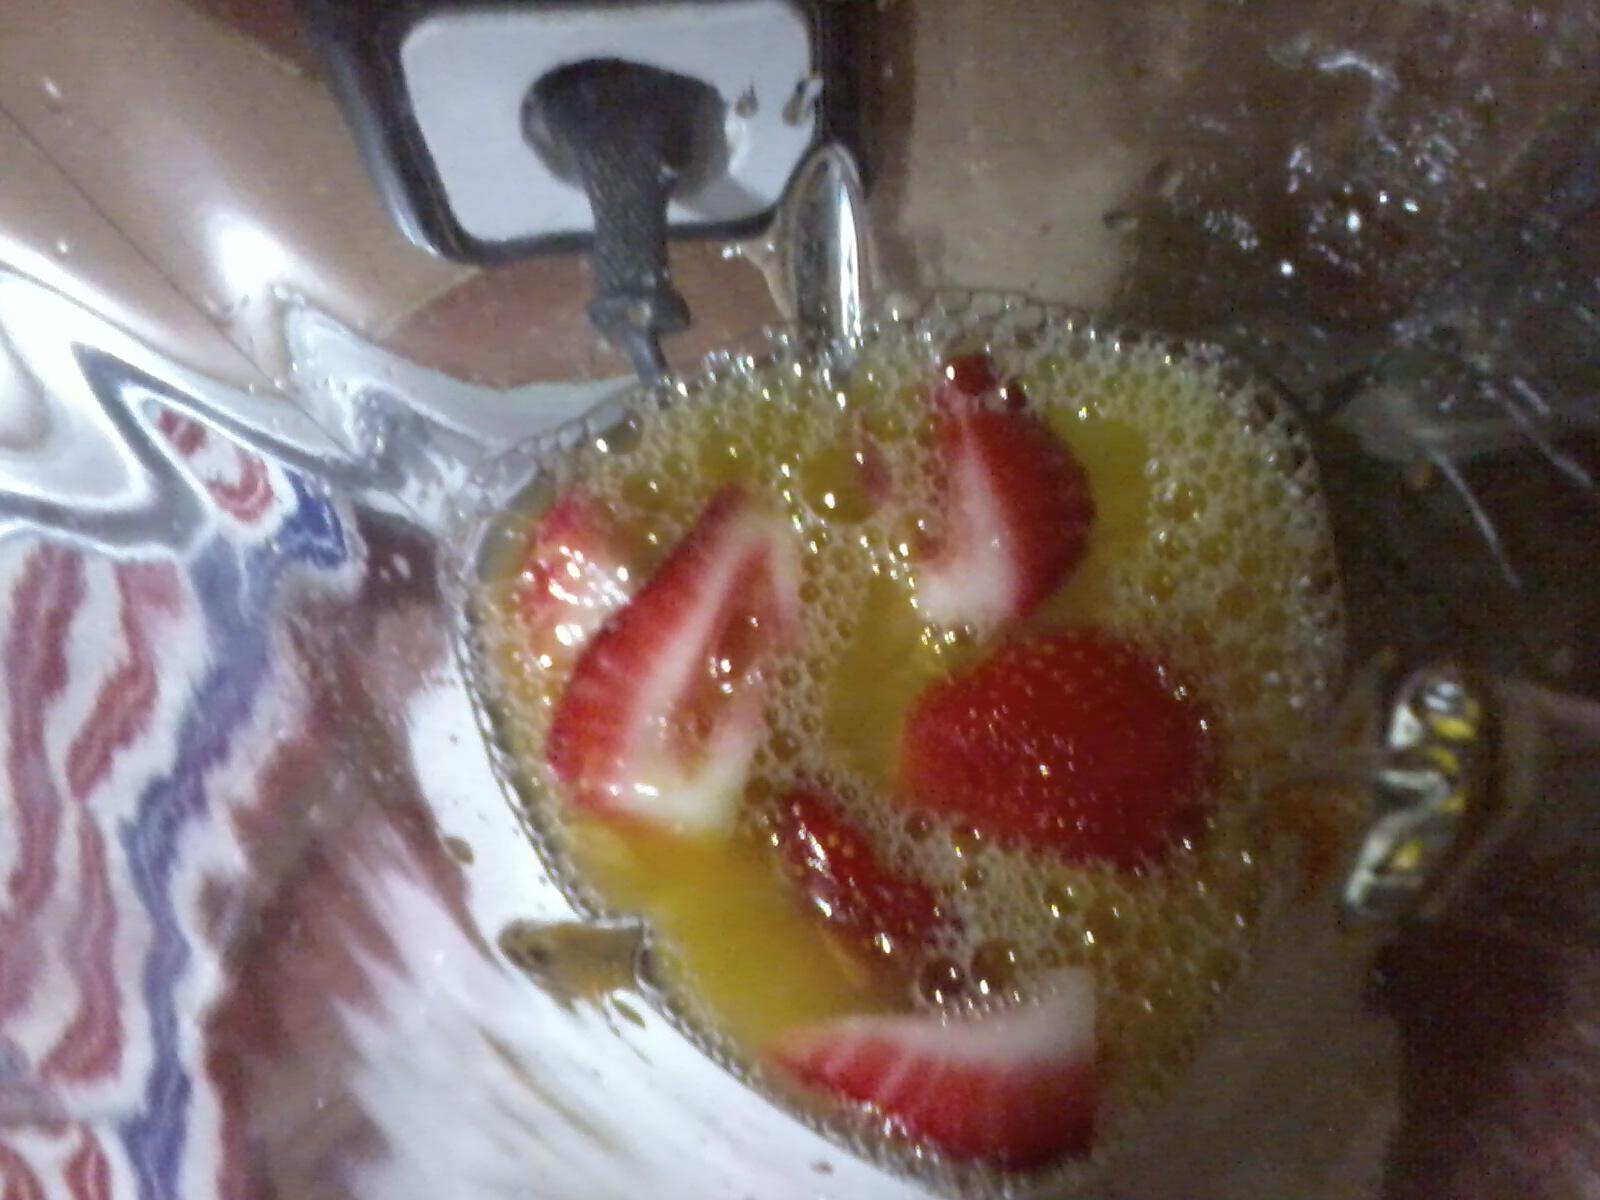 Las recetas de safa zumo de fresa y naranja - Como hacer zumo de fresa ...